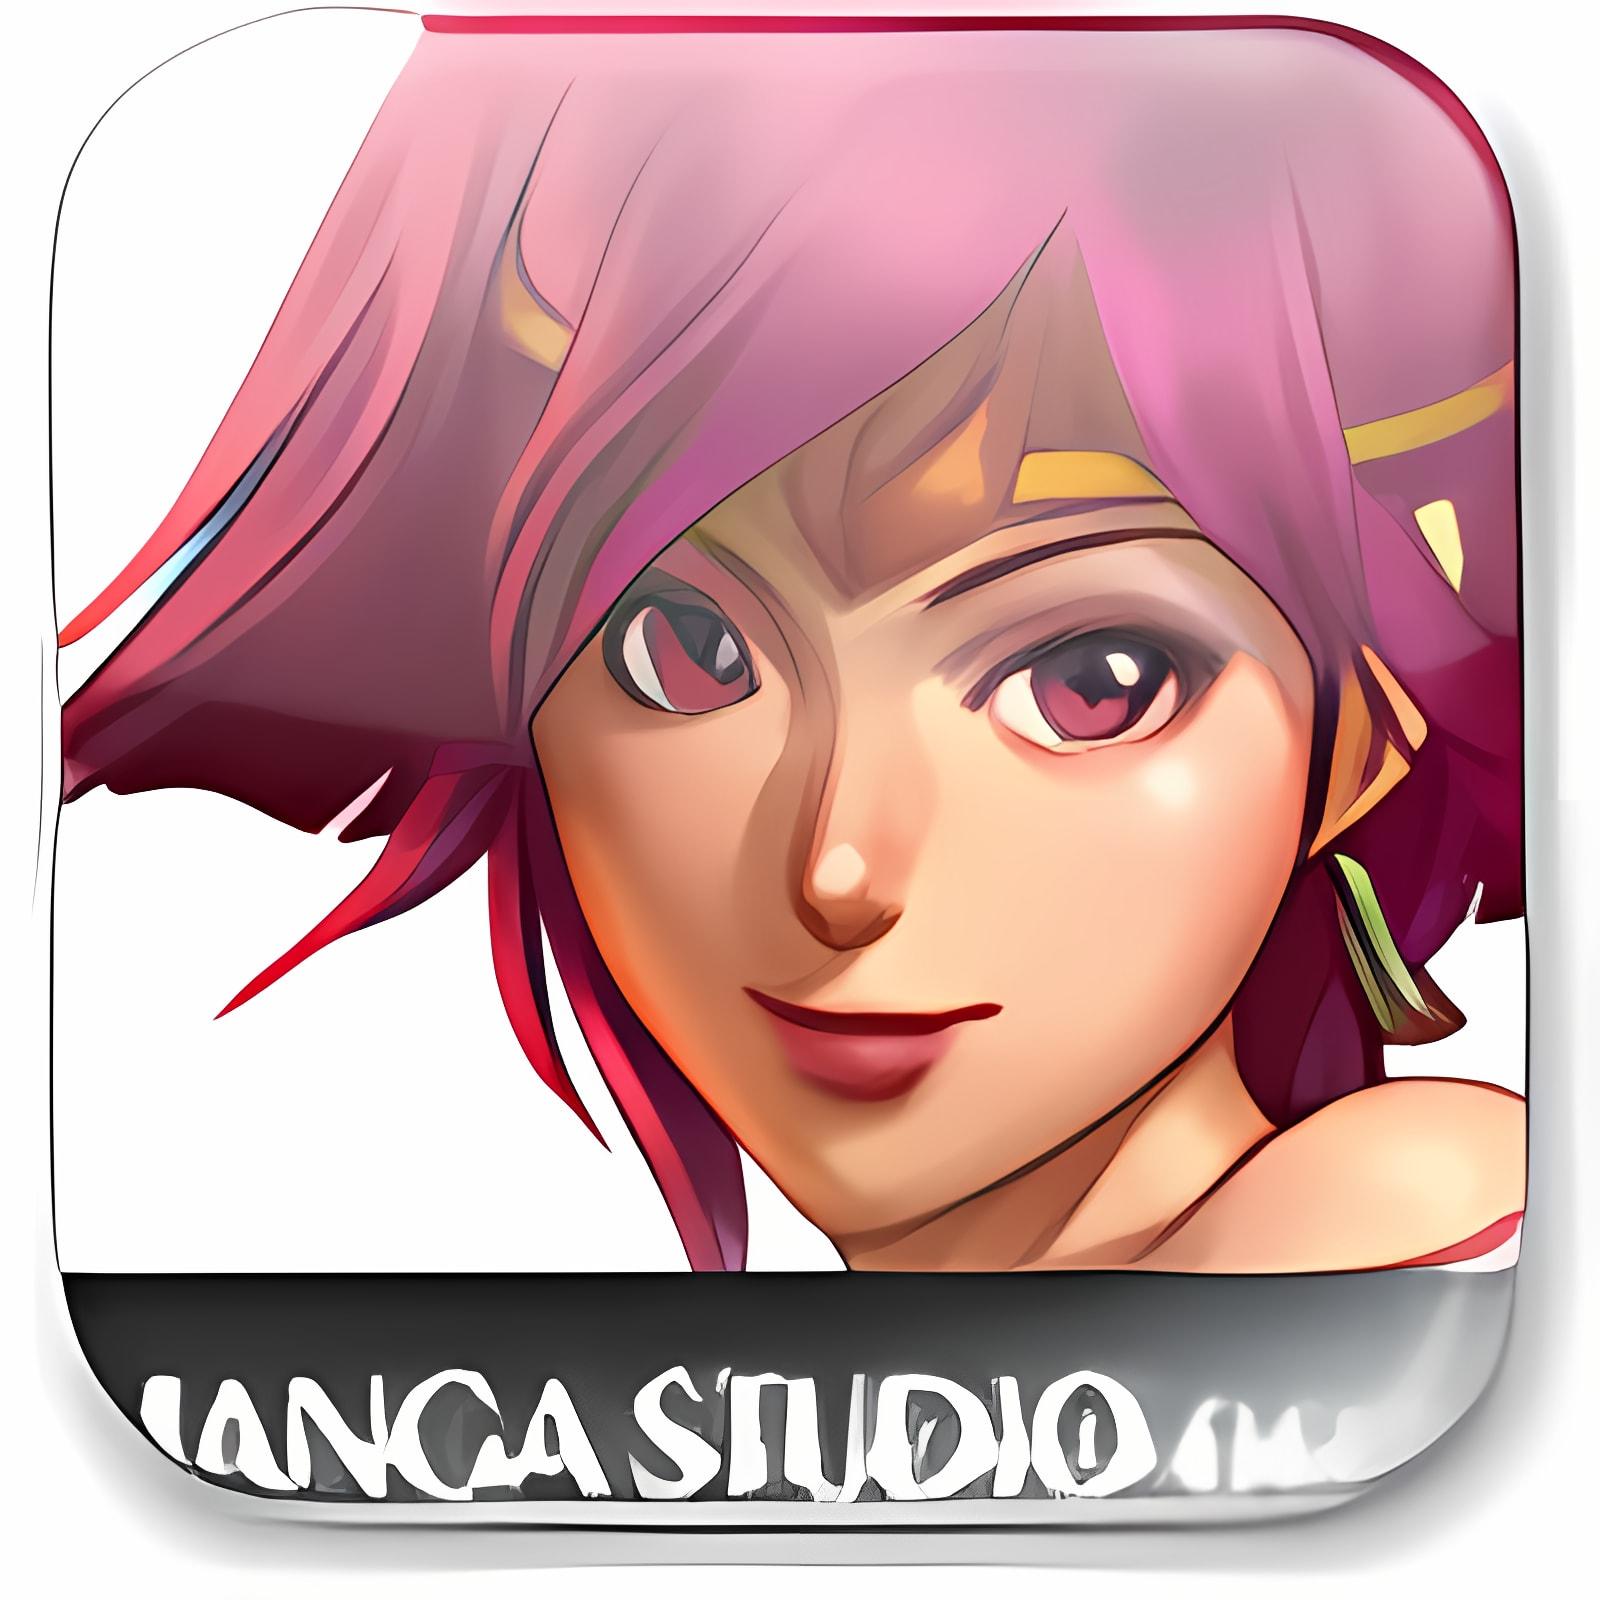 Manga Studio Debut